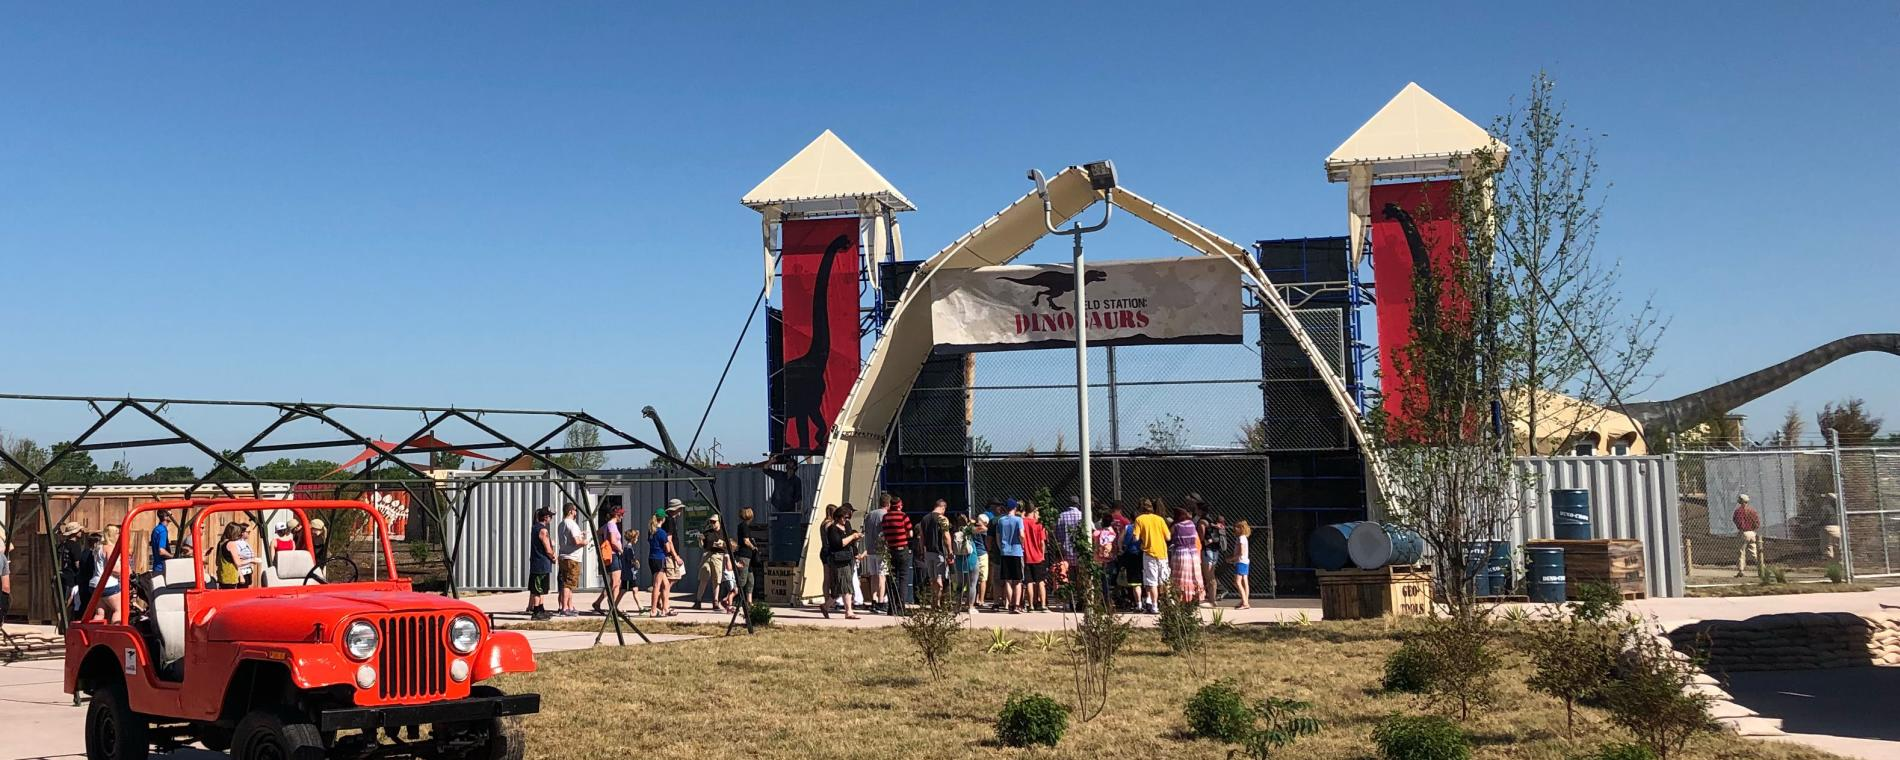 Field Station entrance Visit Wichita